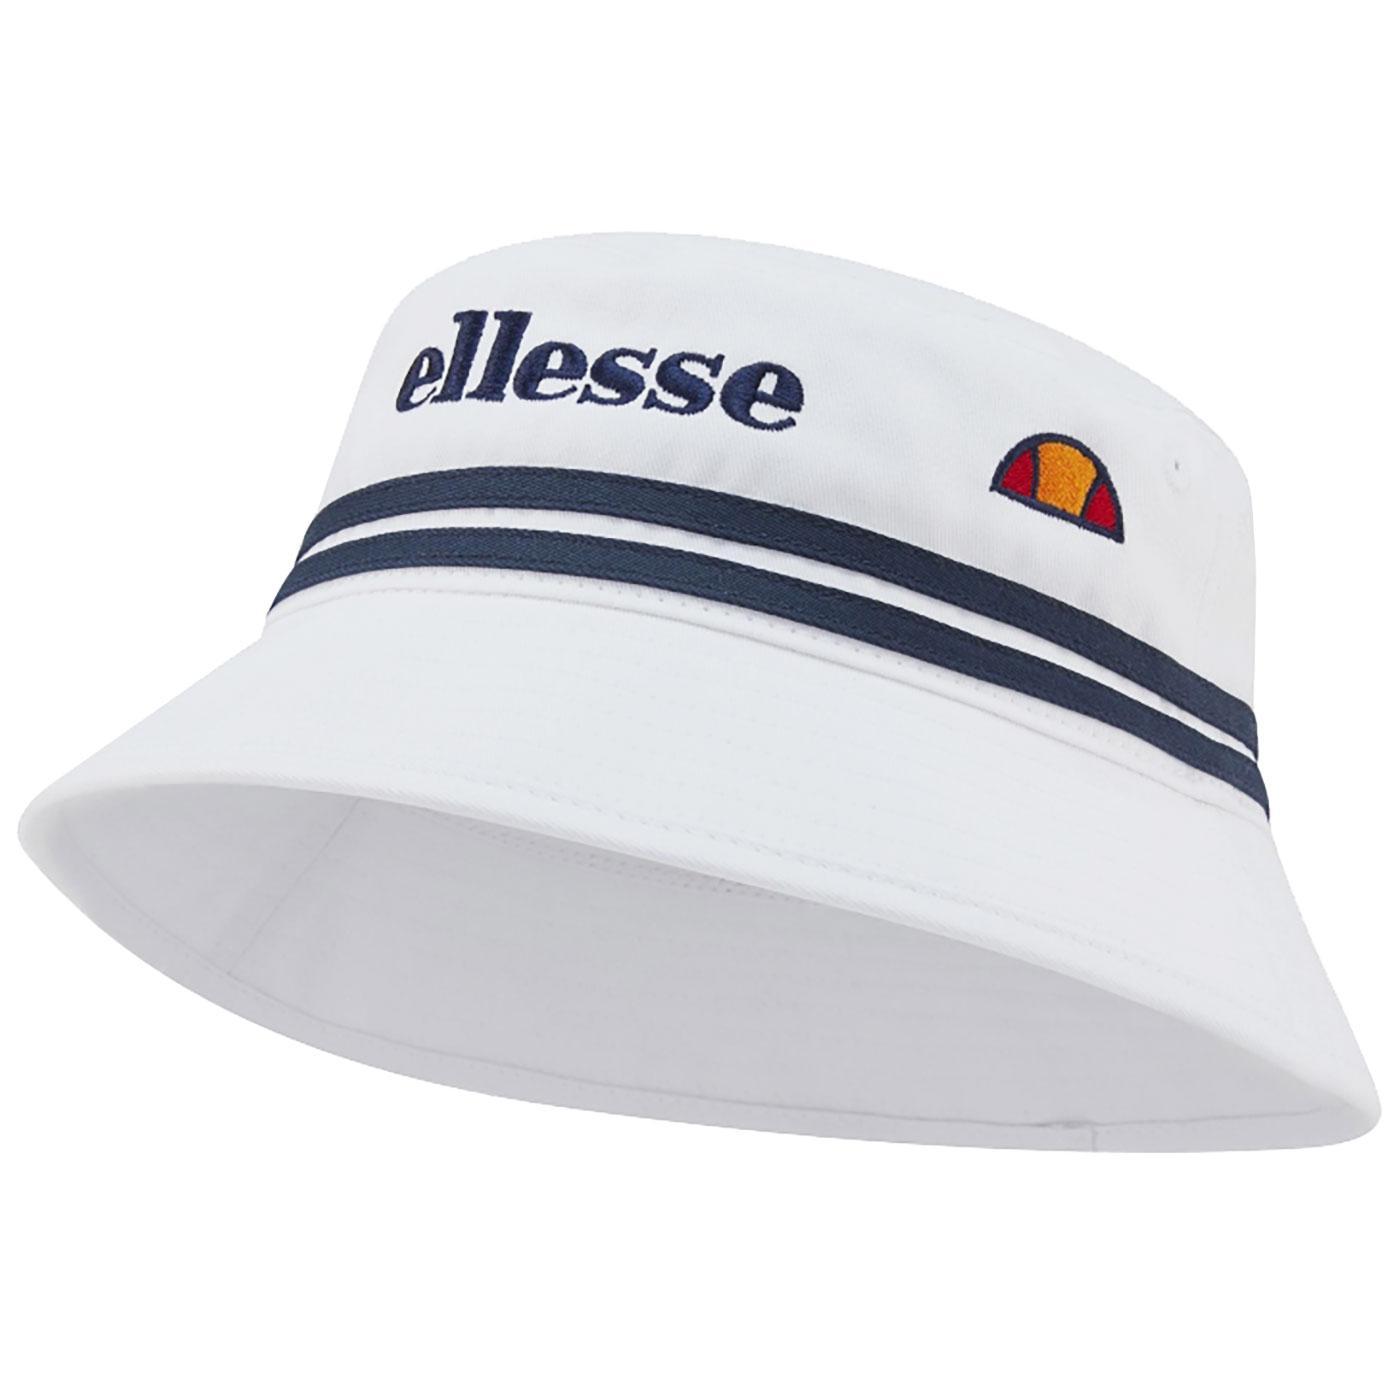 Lorenzo ELLESSE Retro 90s Striped Bucket Hat WHITE